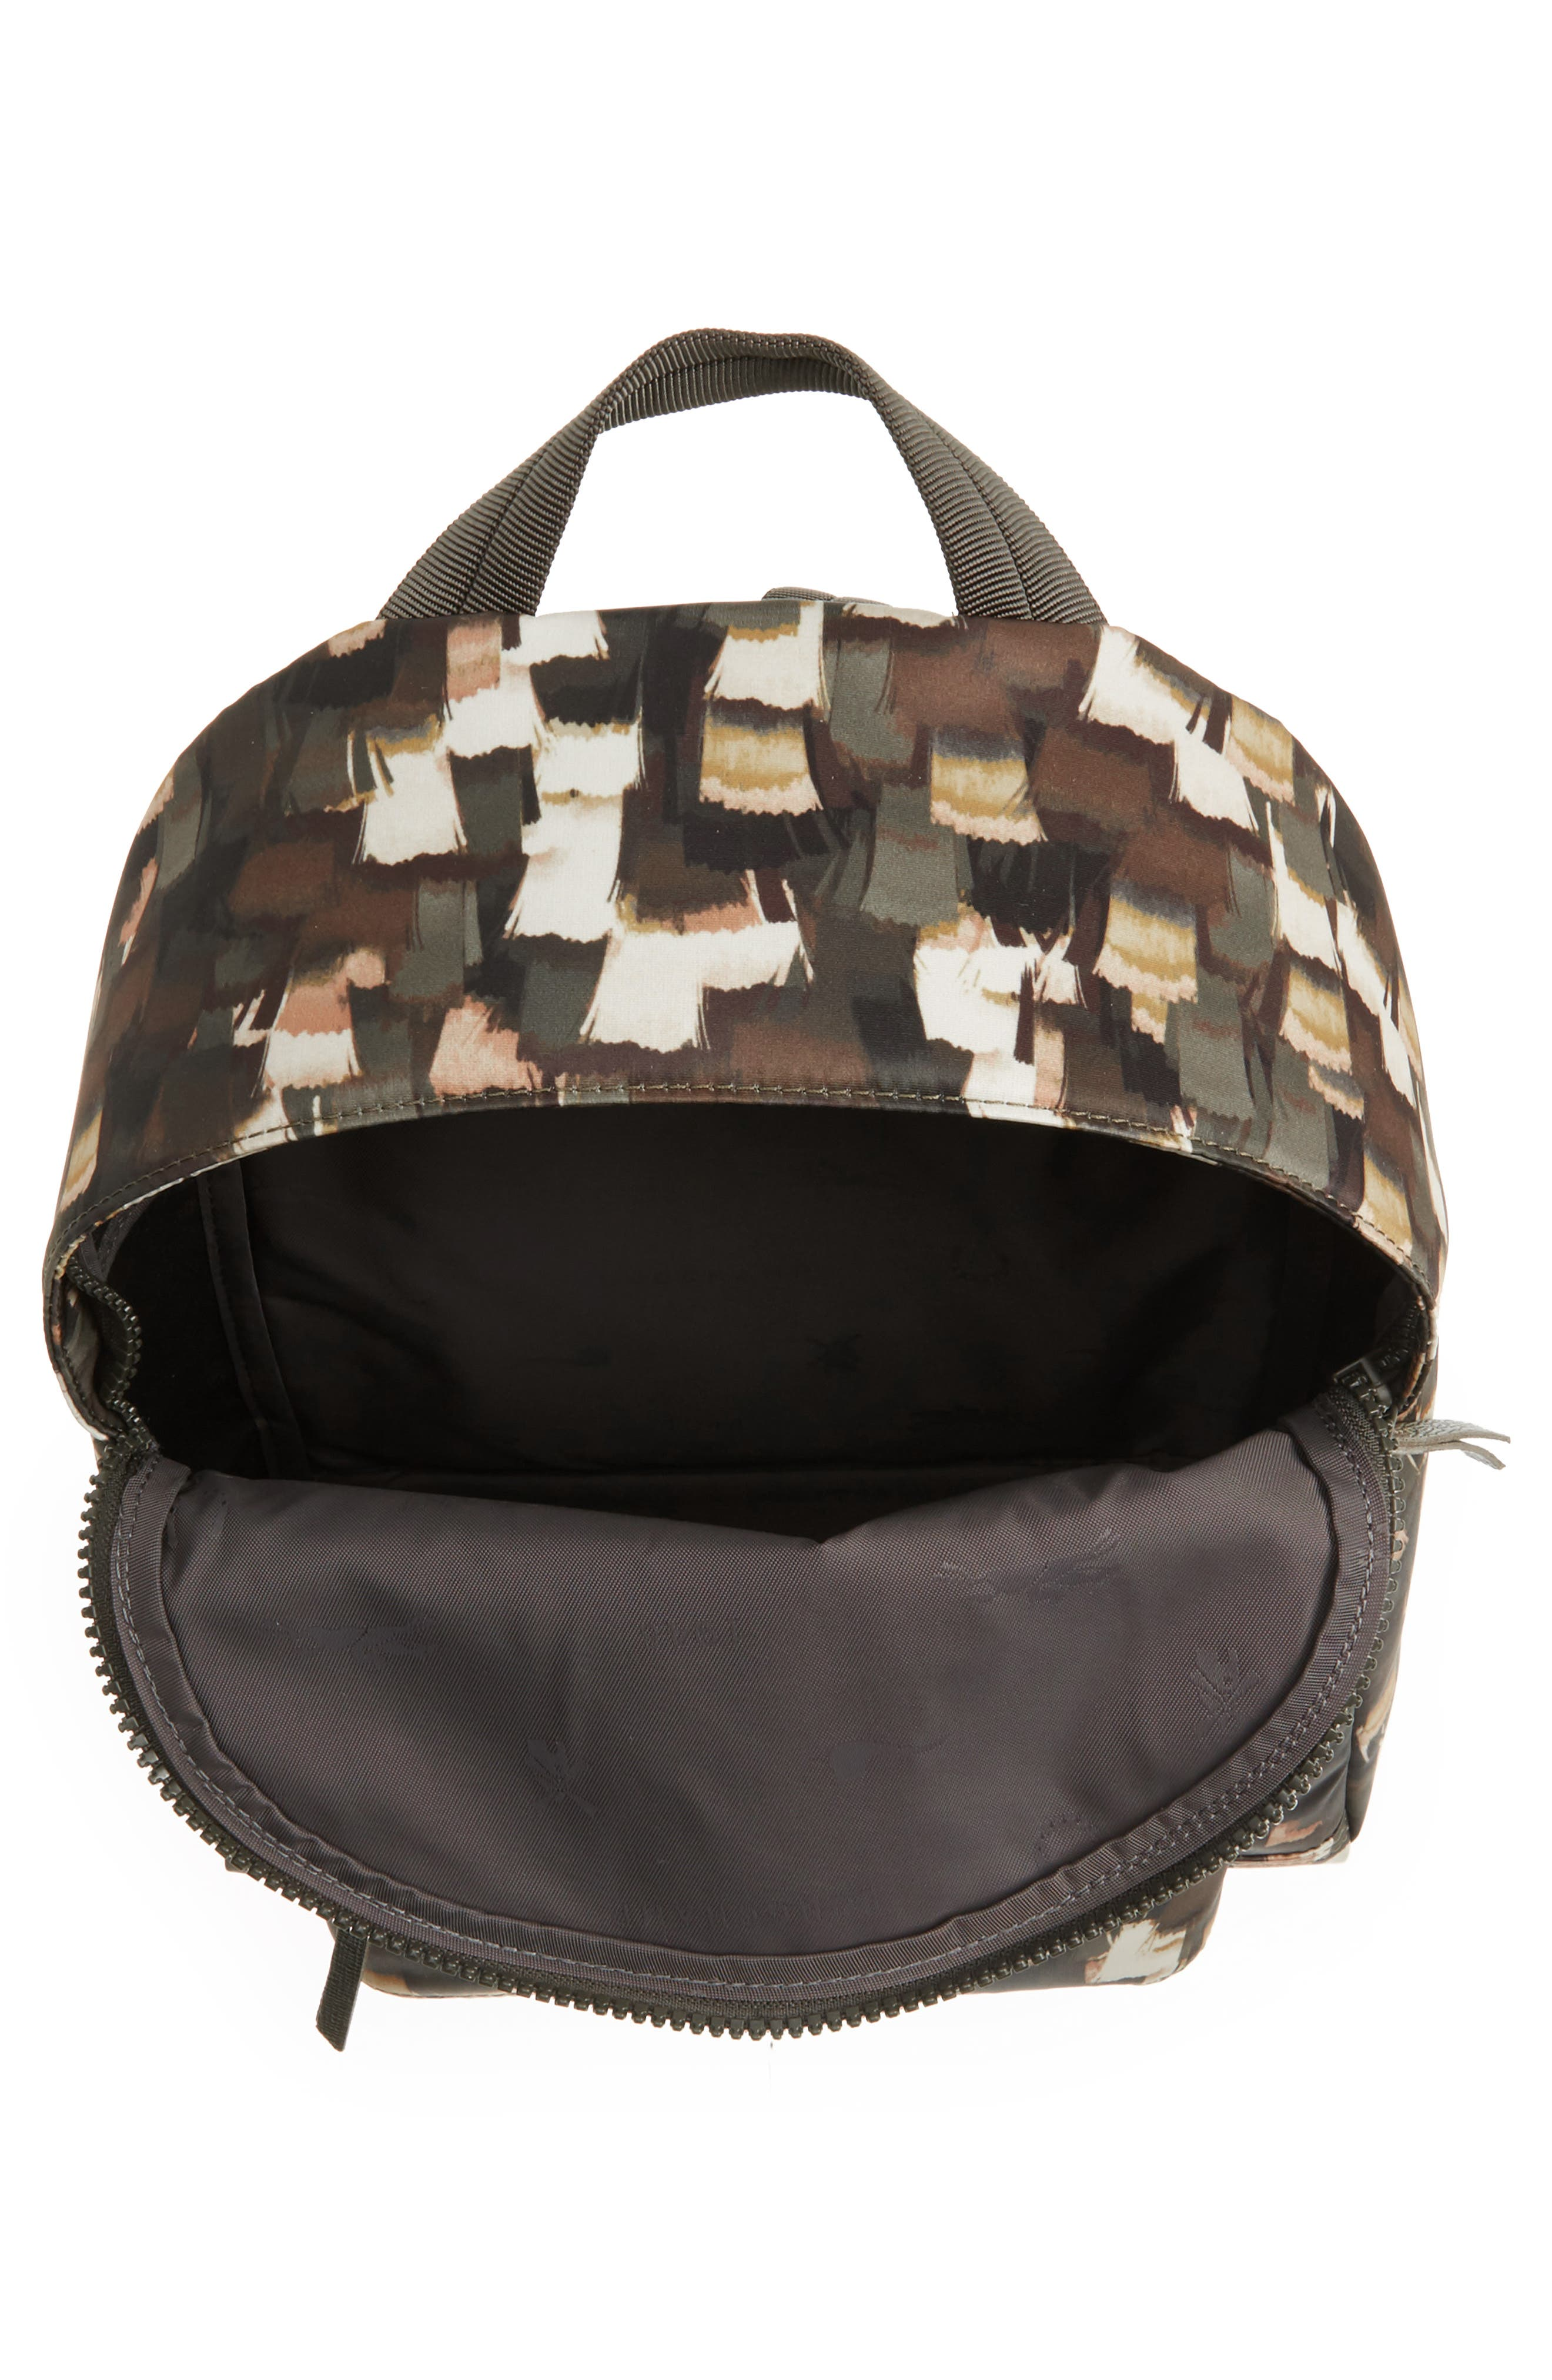 Le Pliage Neo - Vibrations Nylon Backpack,                             Alternate thumbnail 3, color,                             Khaki